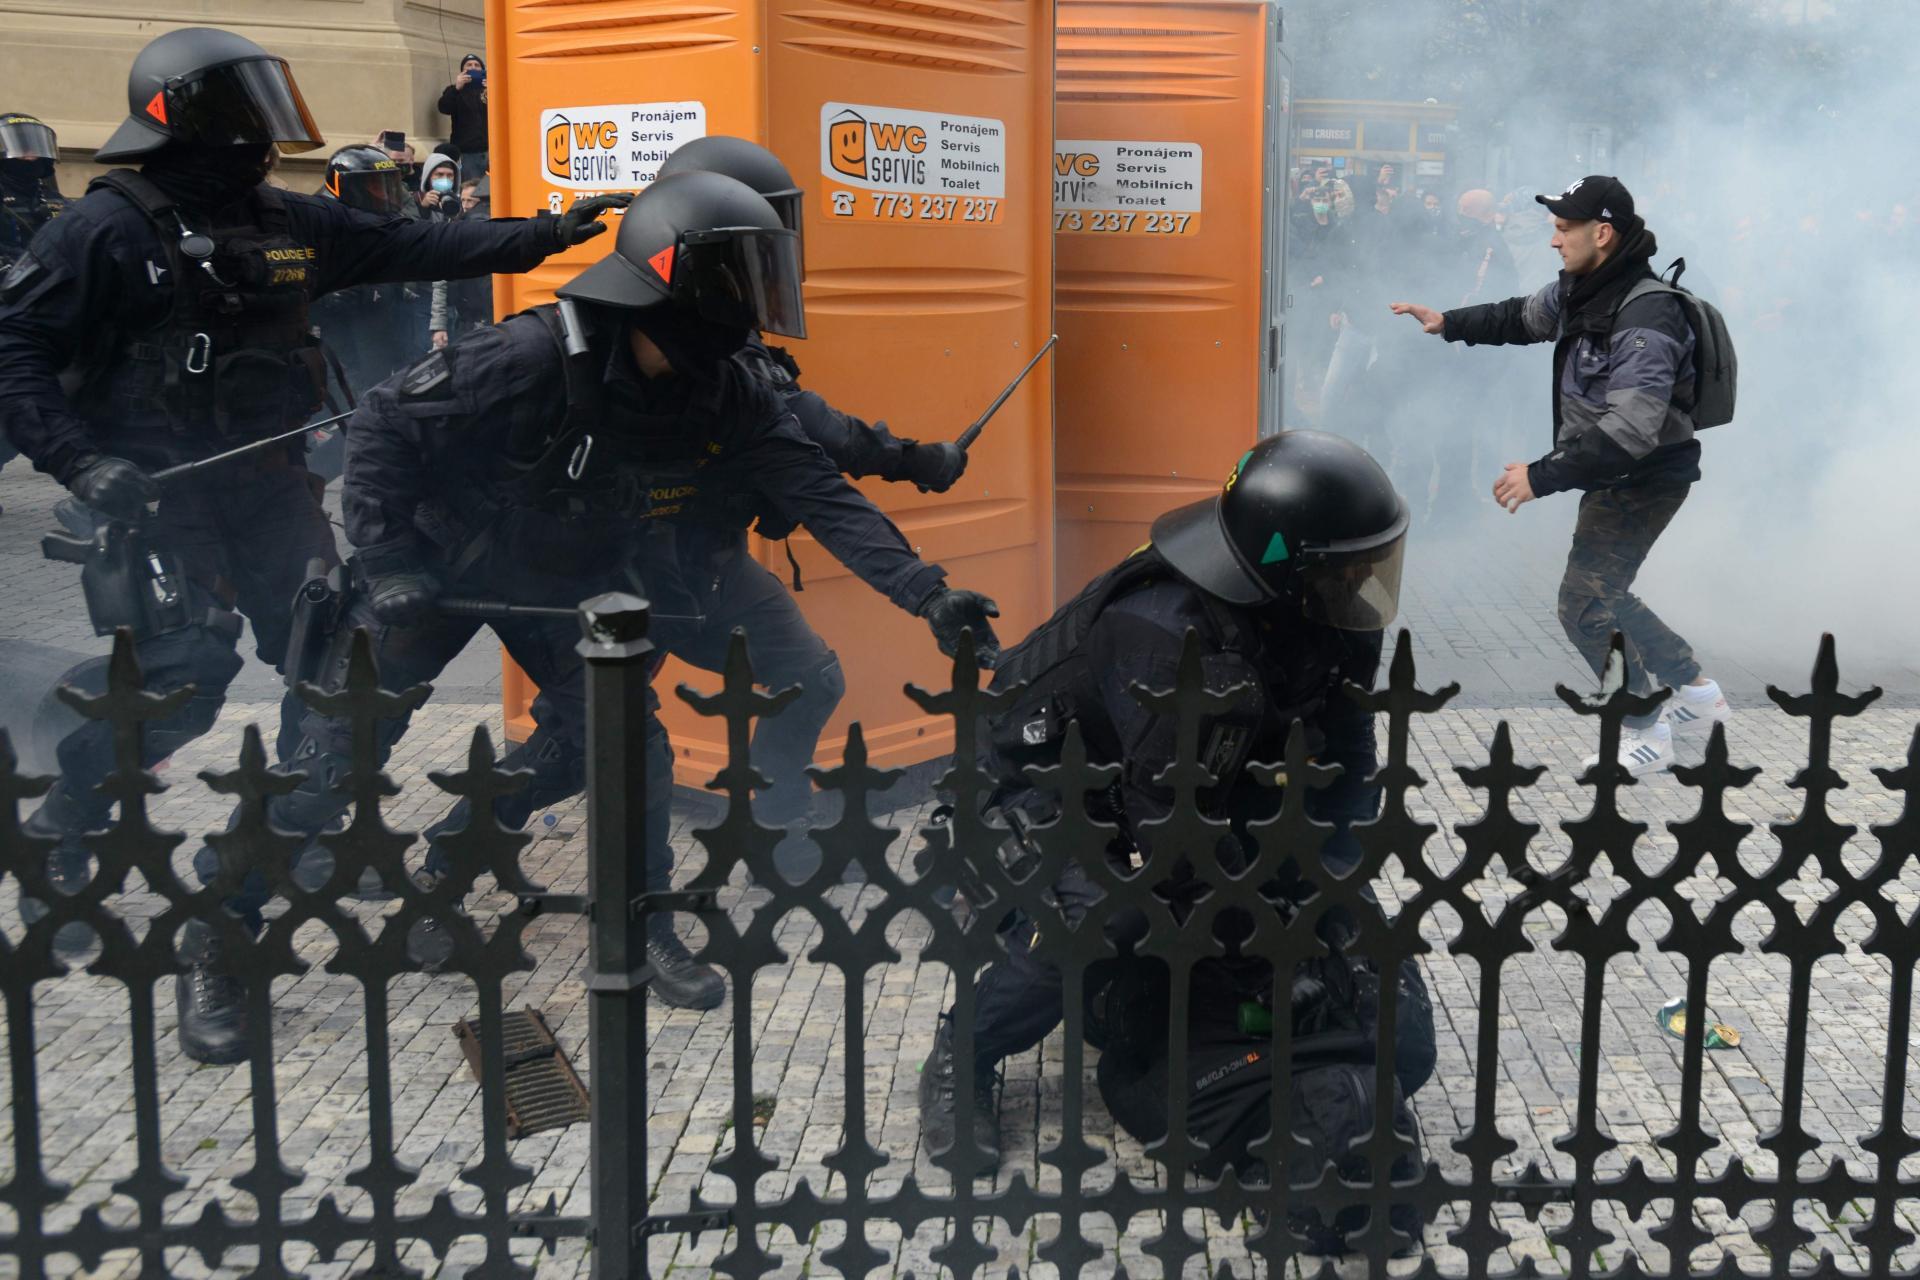 DOŠLO DO ŽESTOKOG OBRAČUNA! Pogledajte šokantne prizore iz Praga nakon najave novog lockdowna